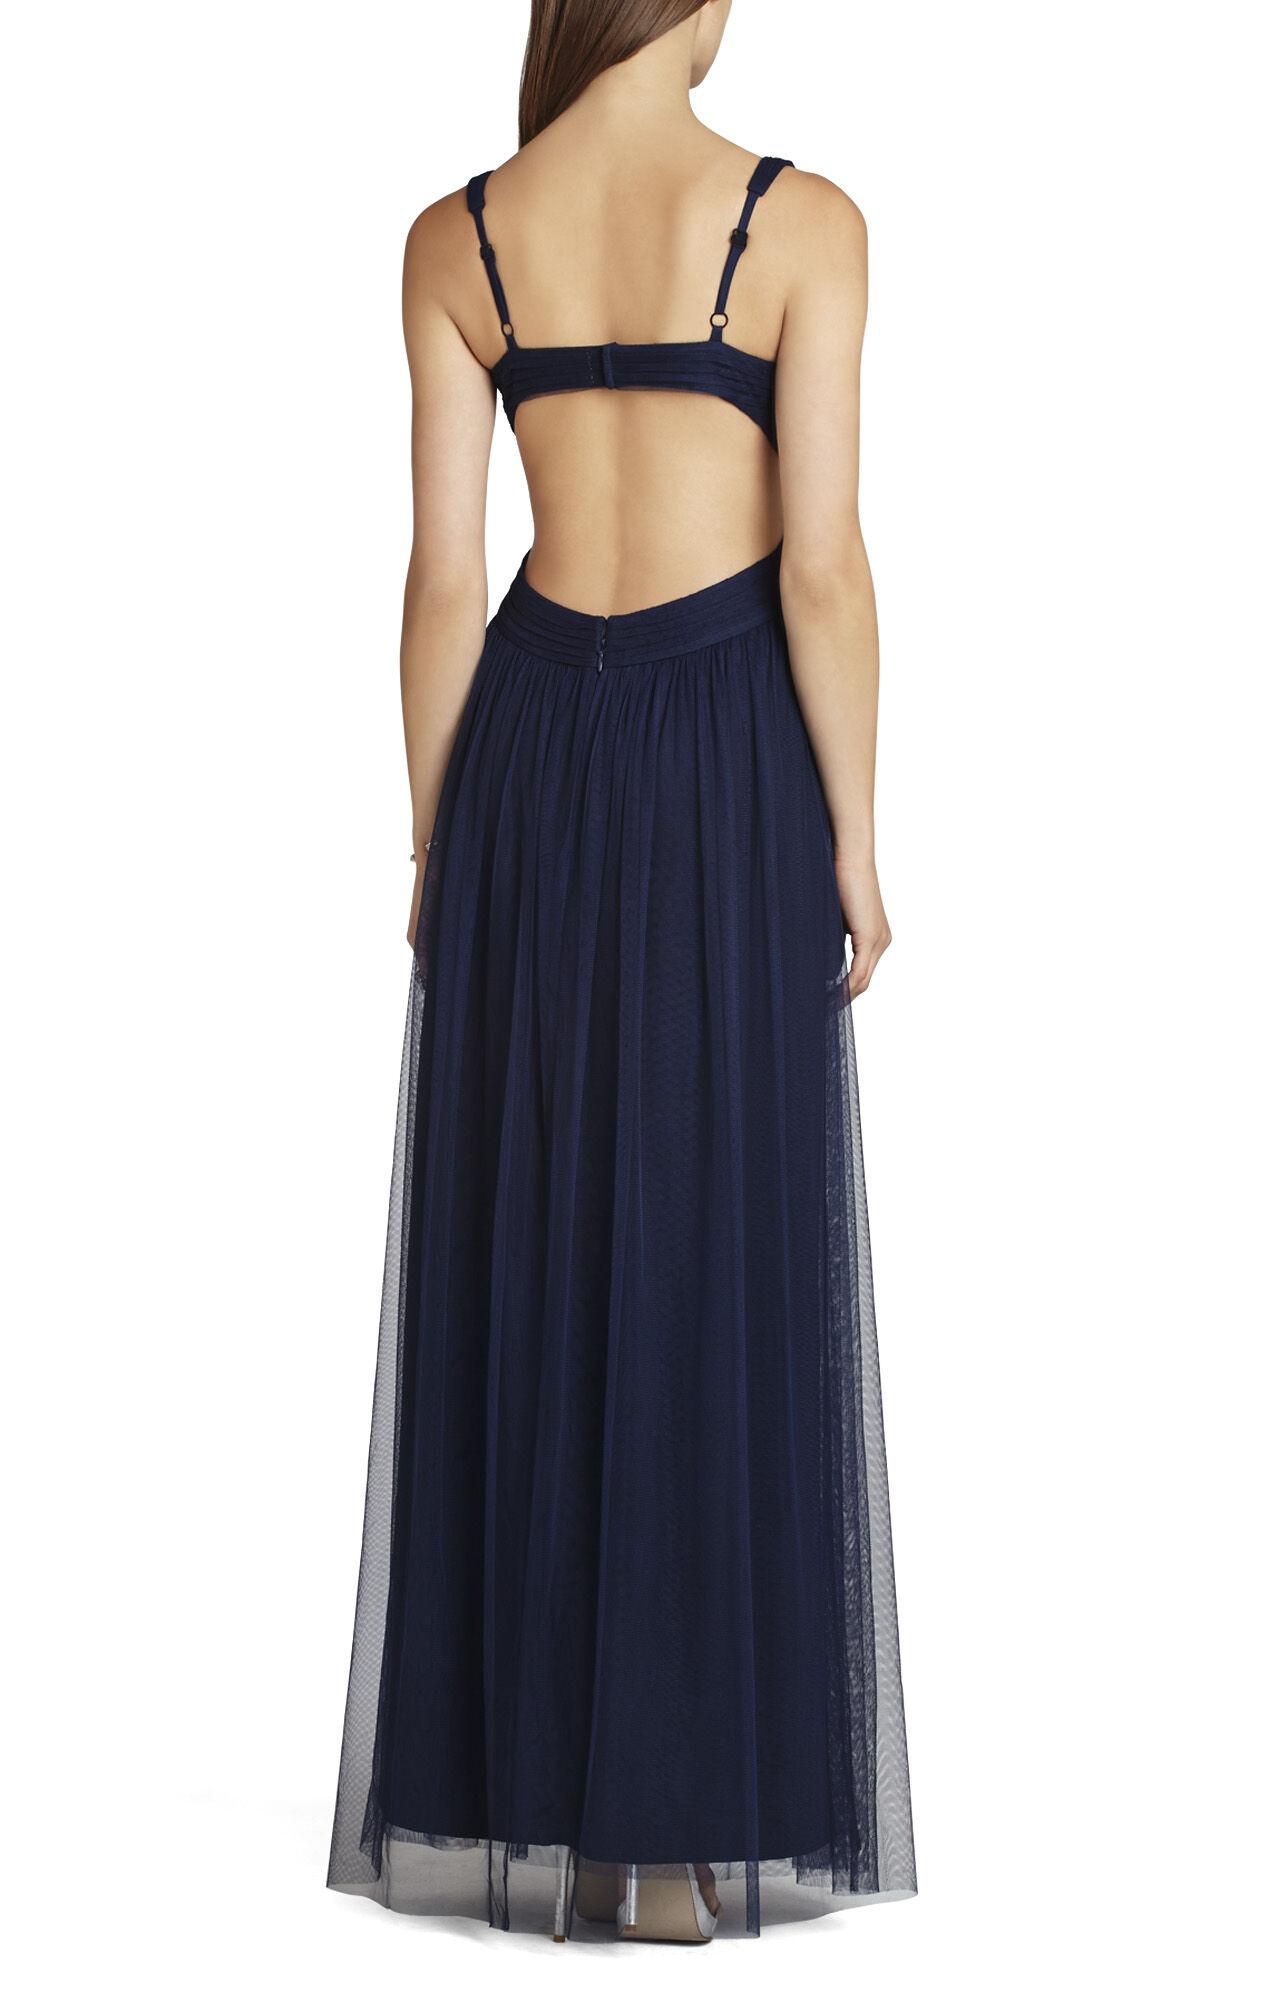 Mara V-Neck Cut-Away Back Gown